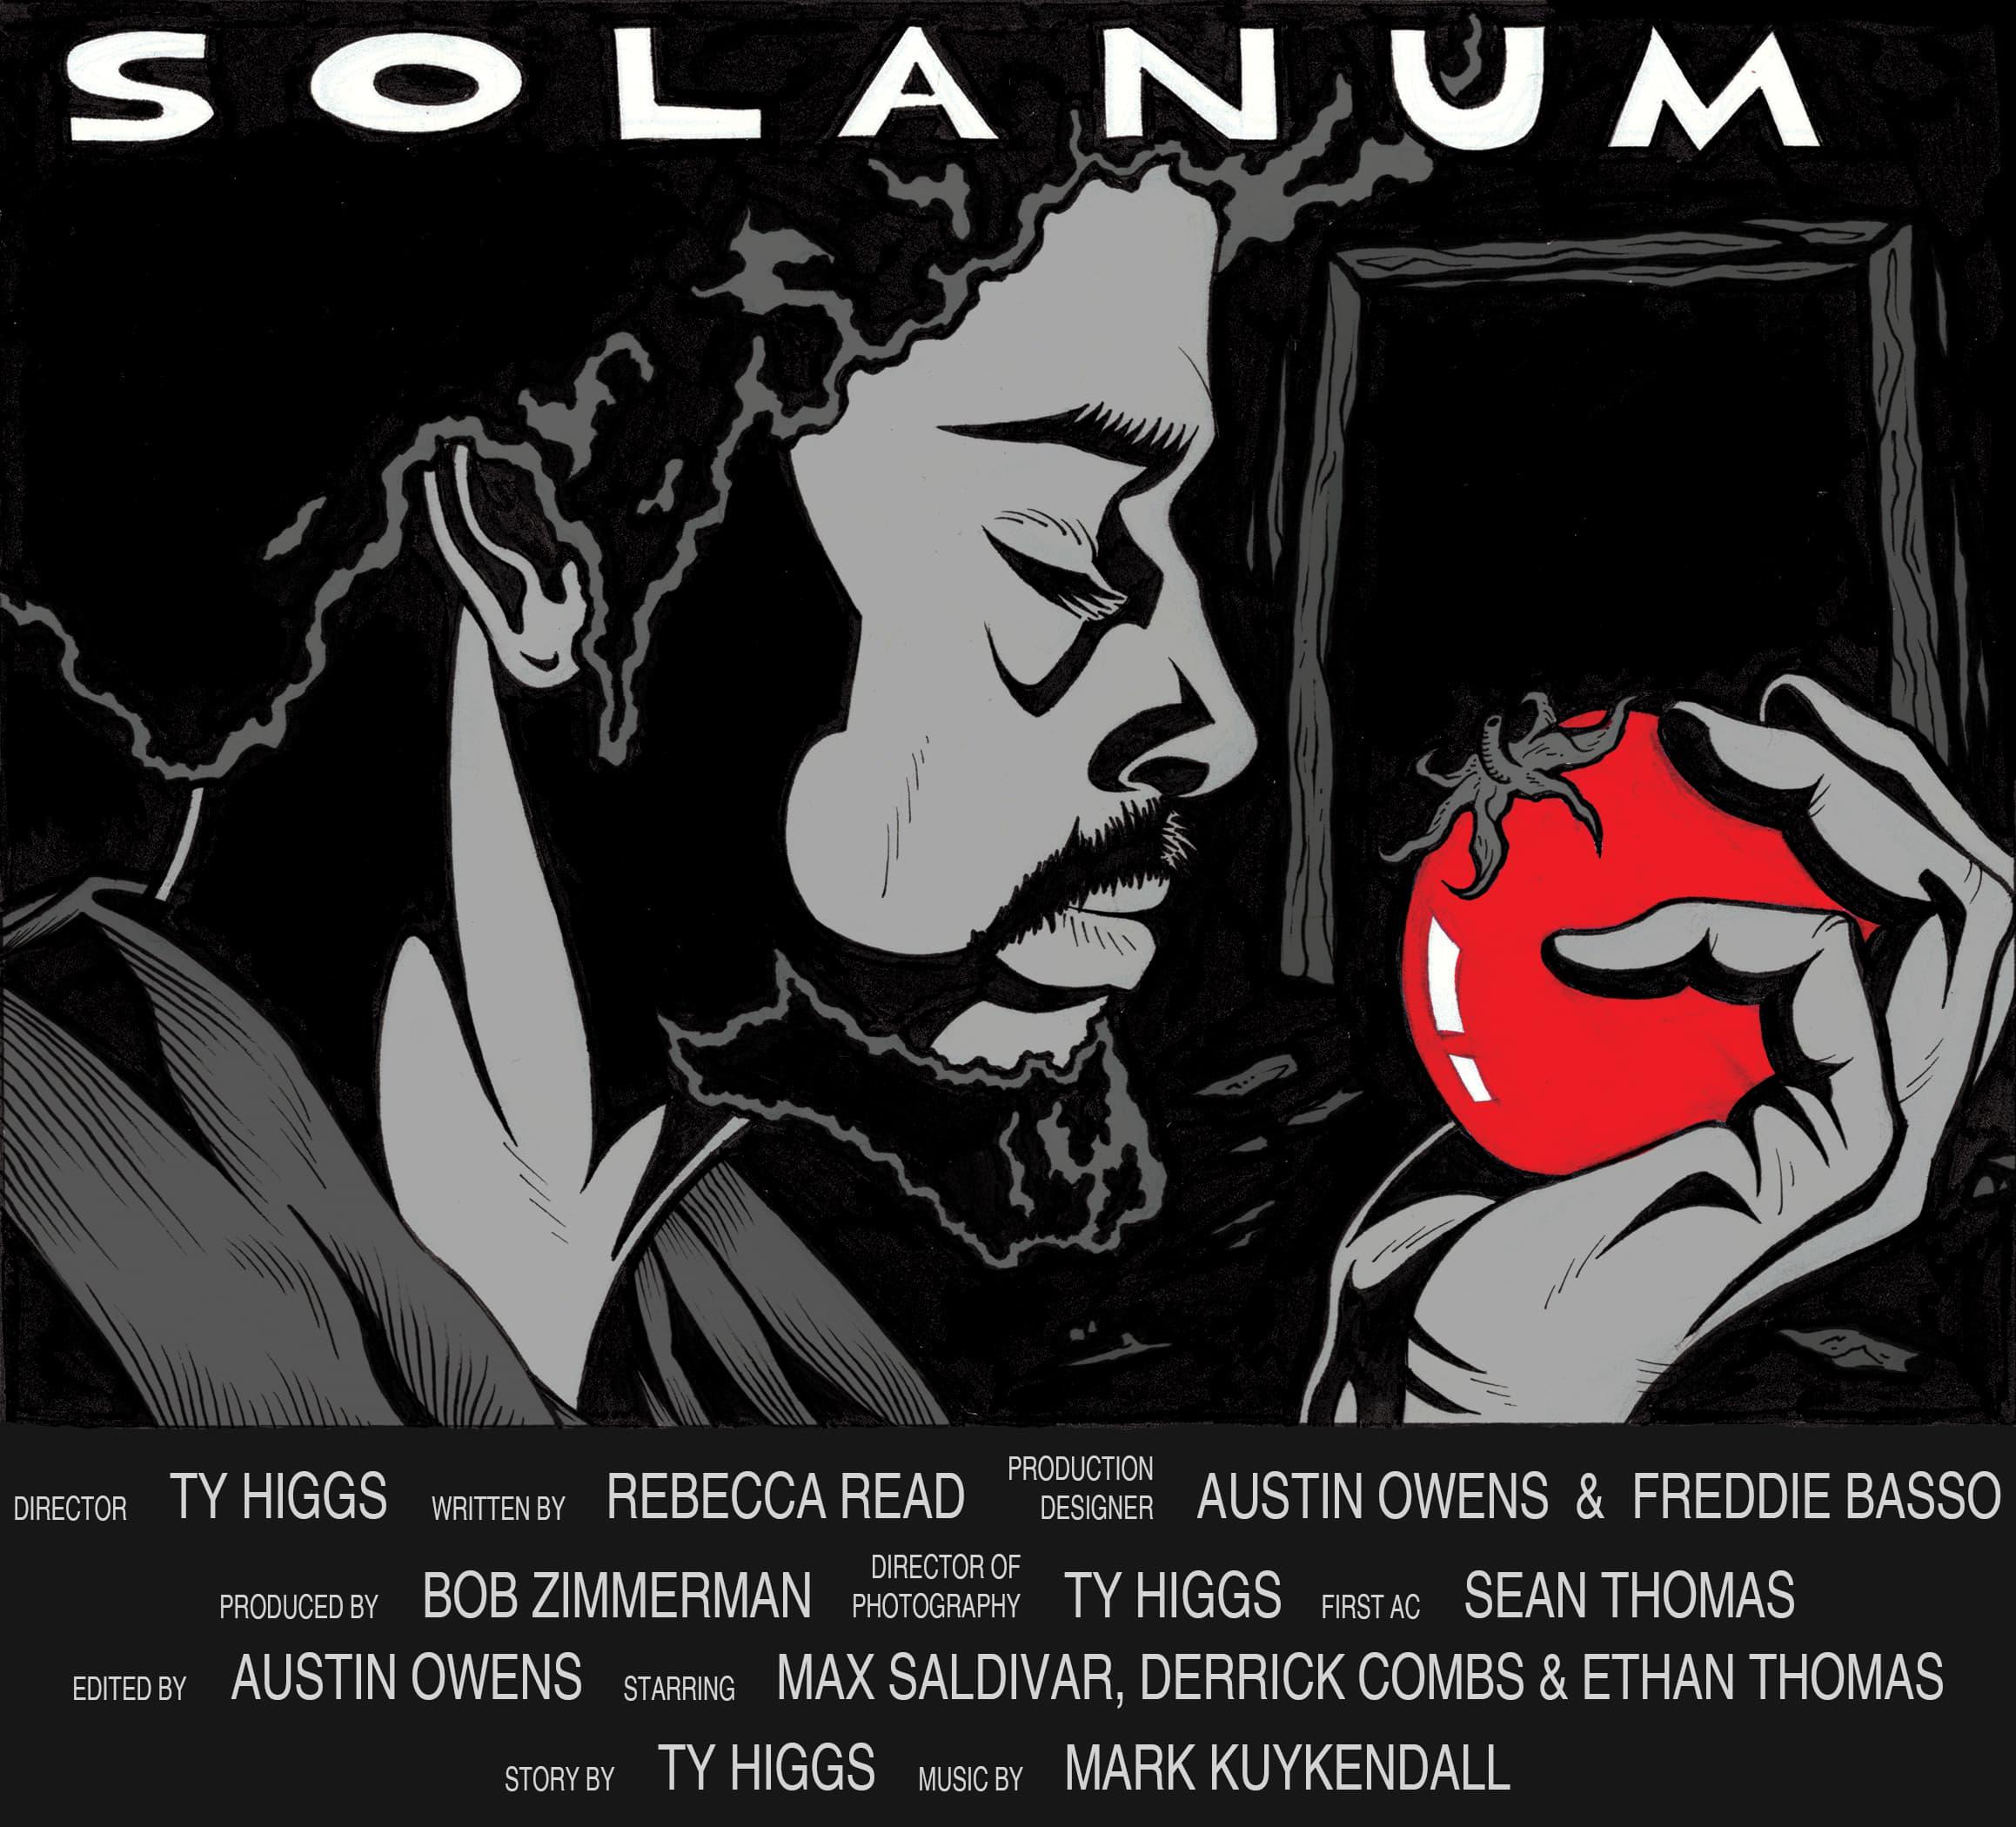 Solanum - Poster.jpg